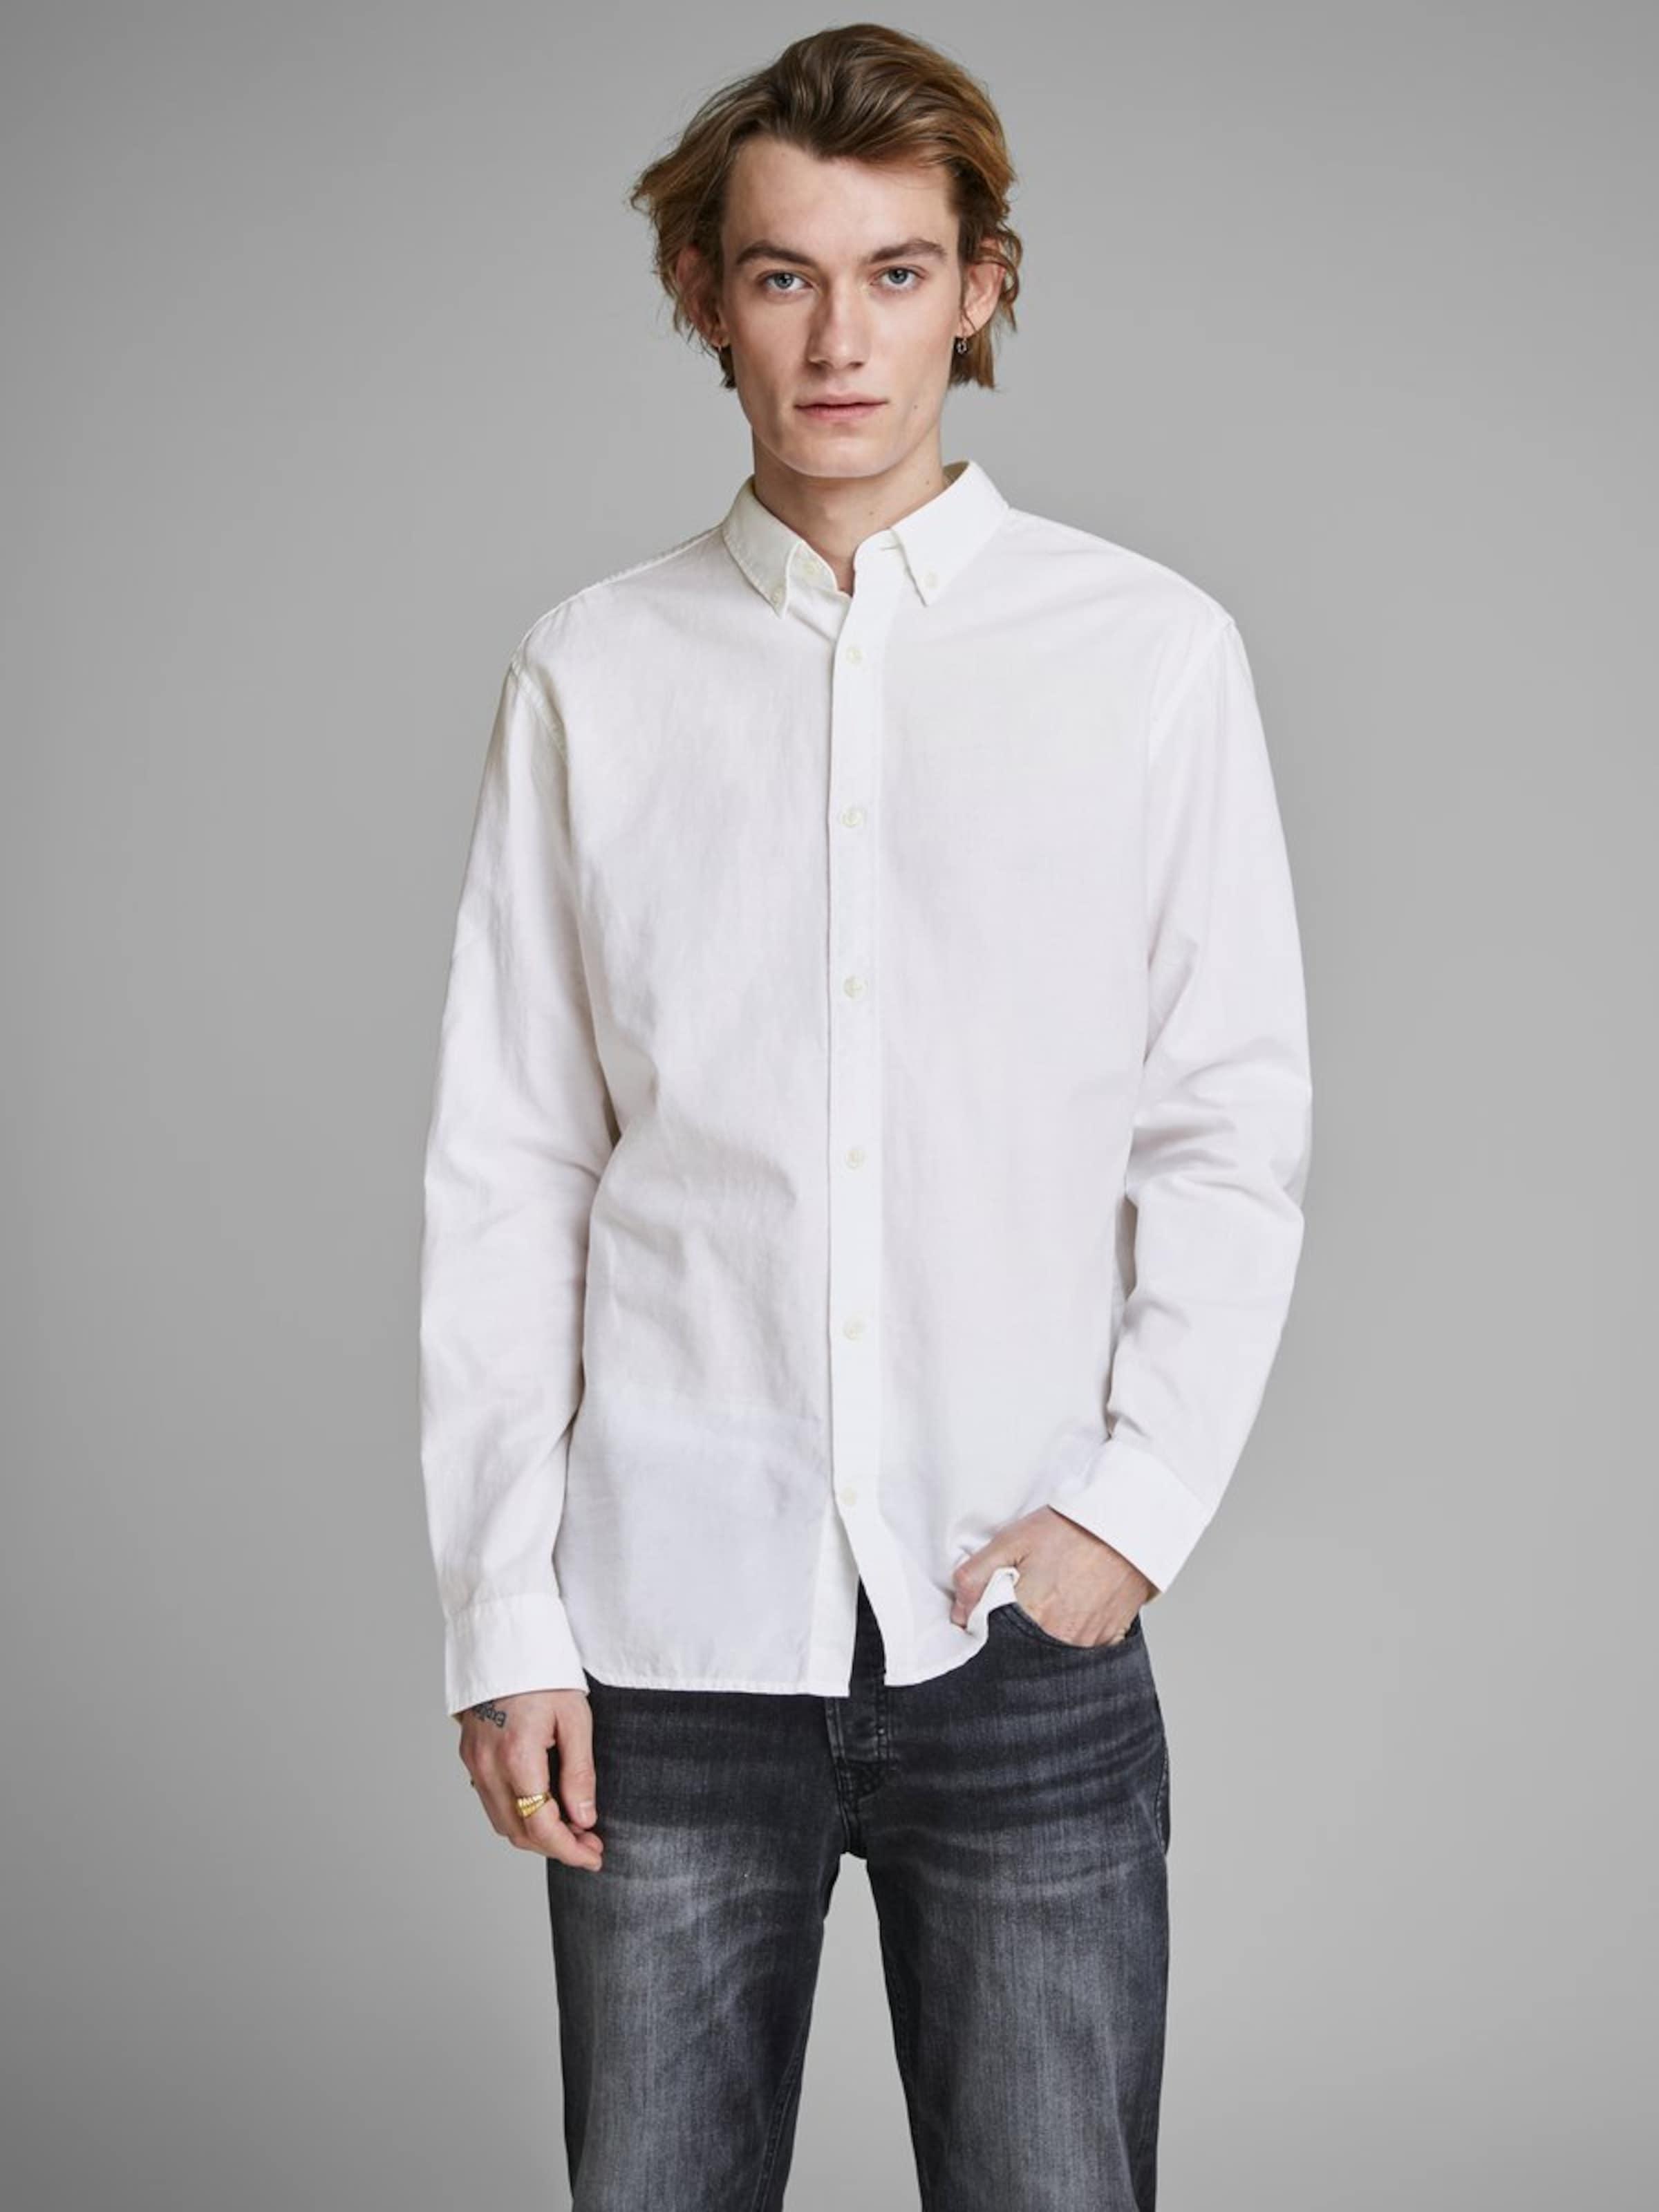 Hemd Jackamp; Jackamp; Hemd Jones Hemd In Weiß Weiß In Jackamp; Jones Jones 3AL5Rj4